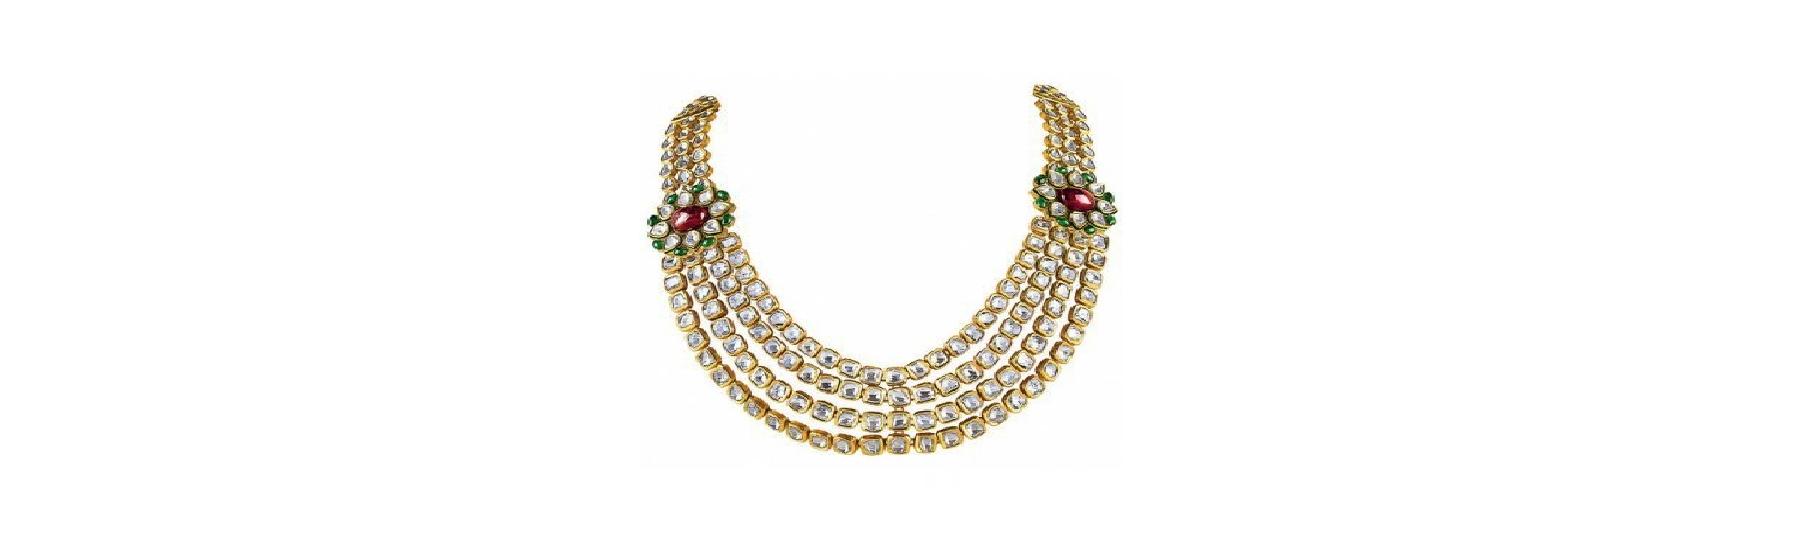 KK Jewels necklace